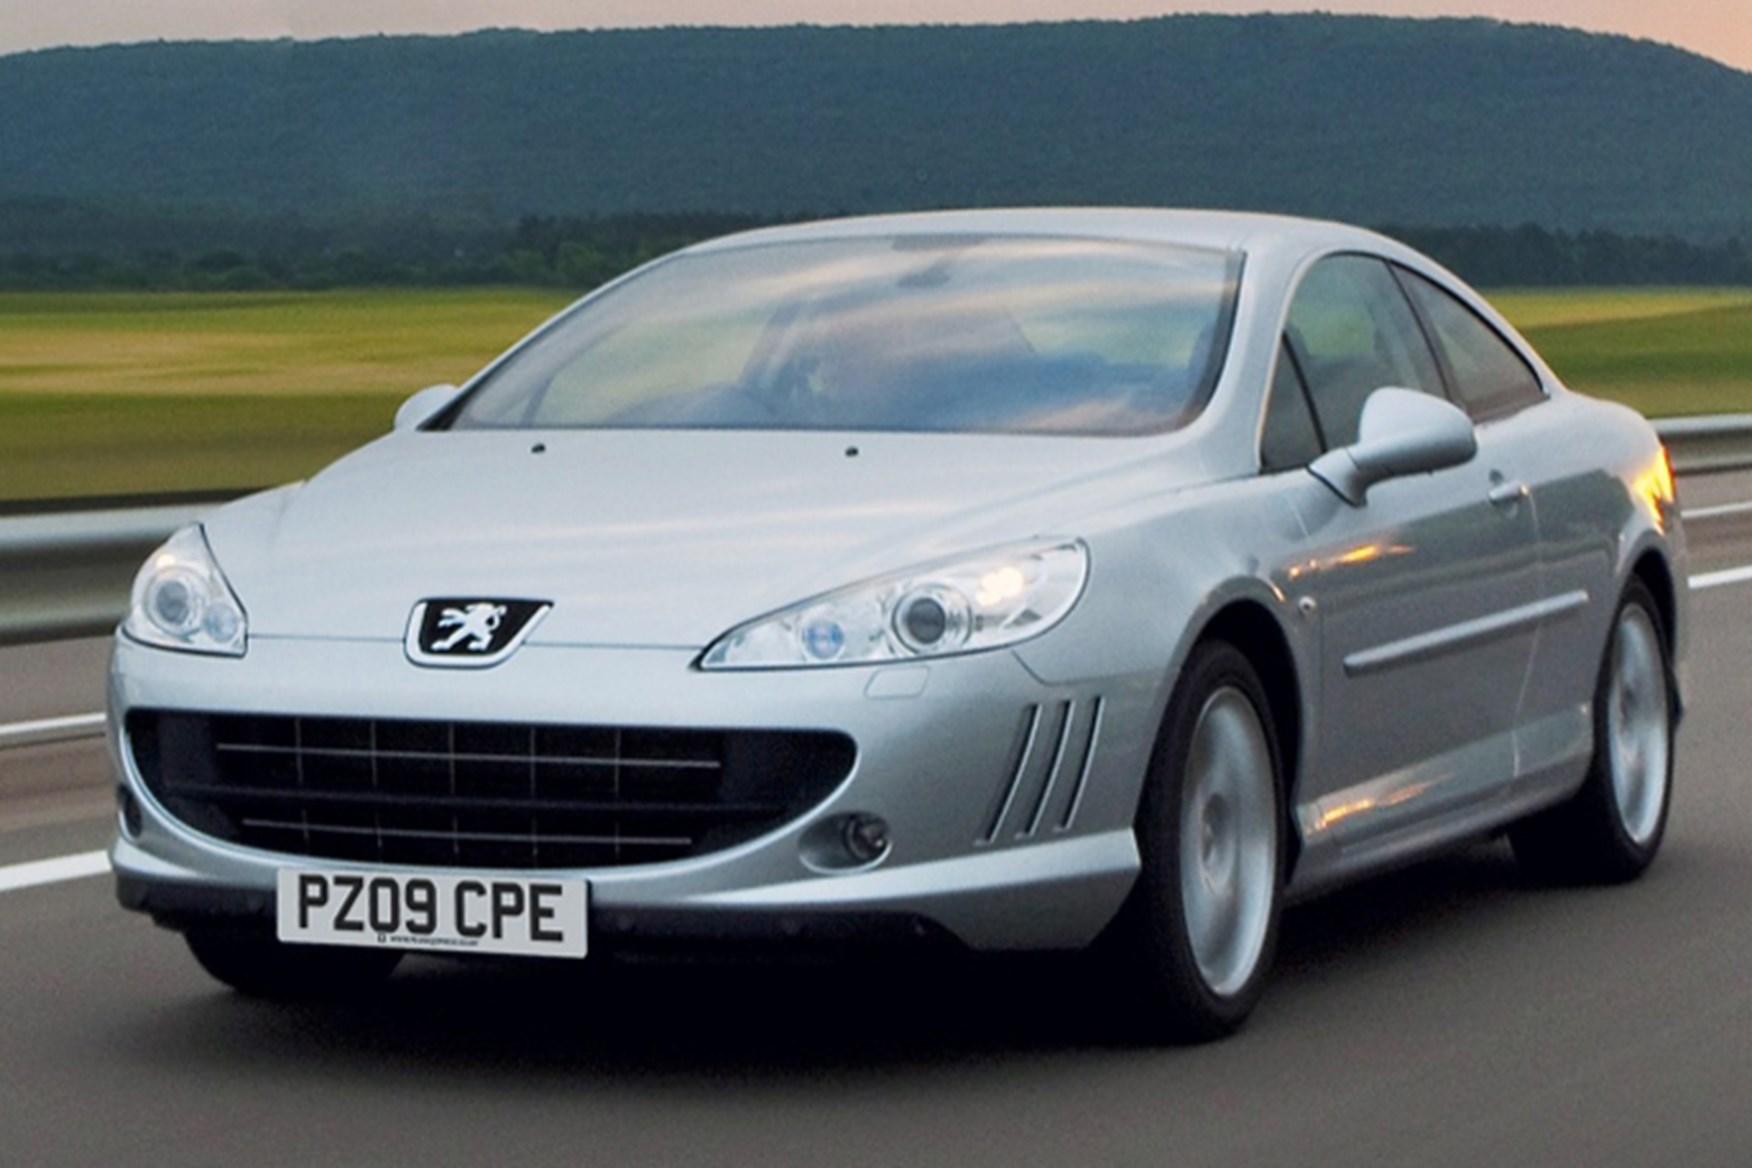 top gear peugeot 407 coupe смотреть онлайн